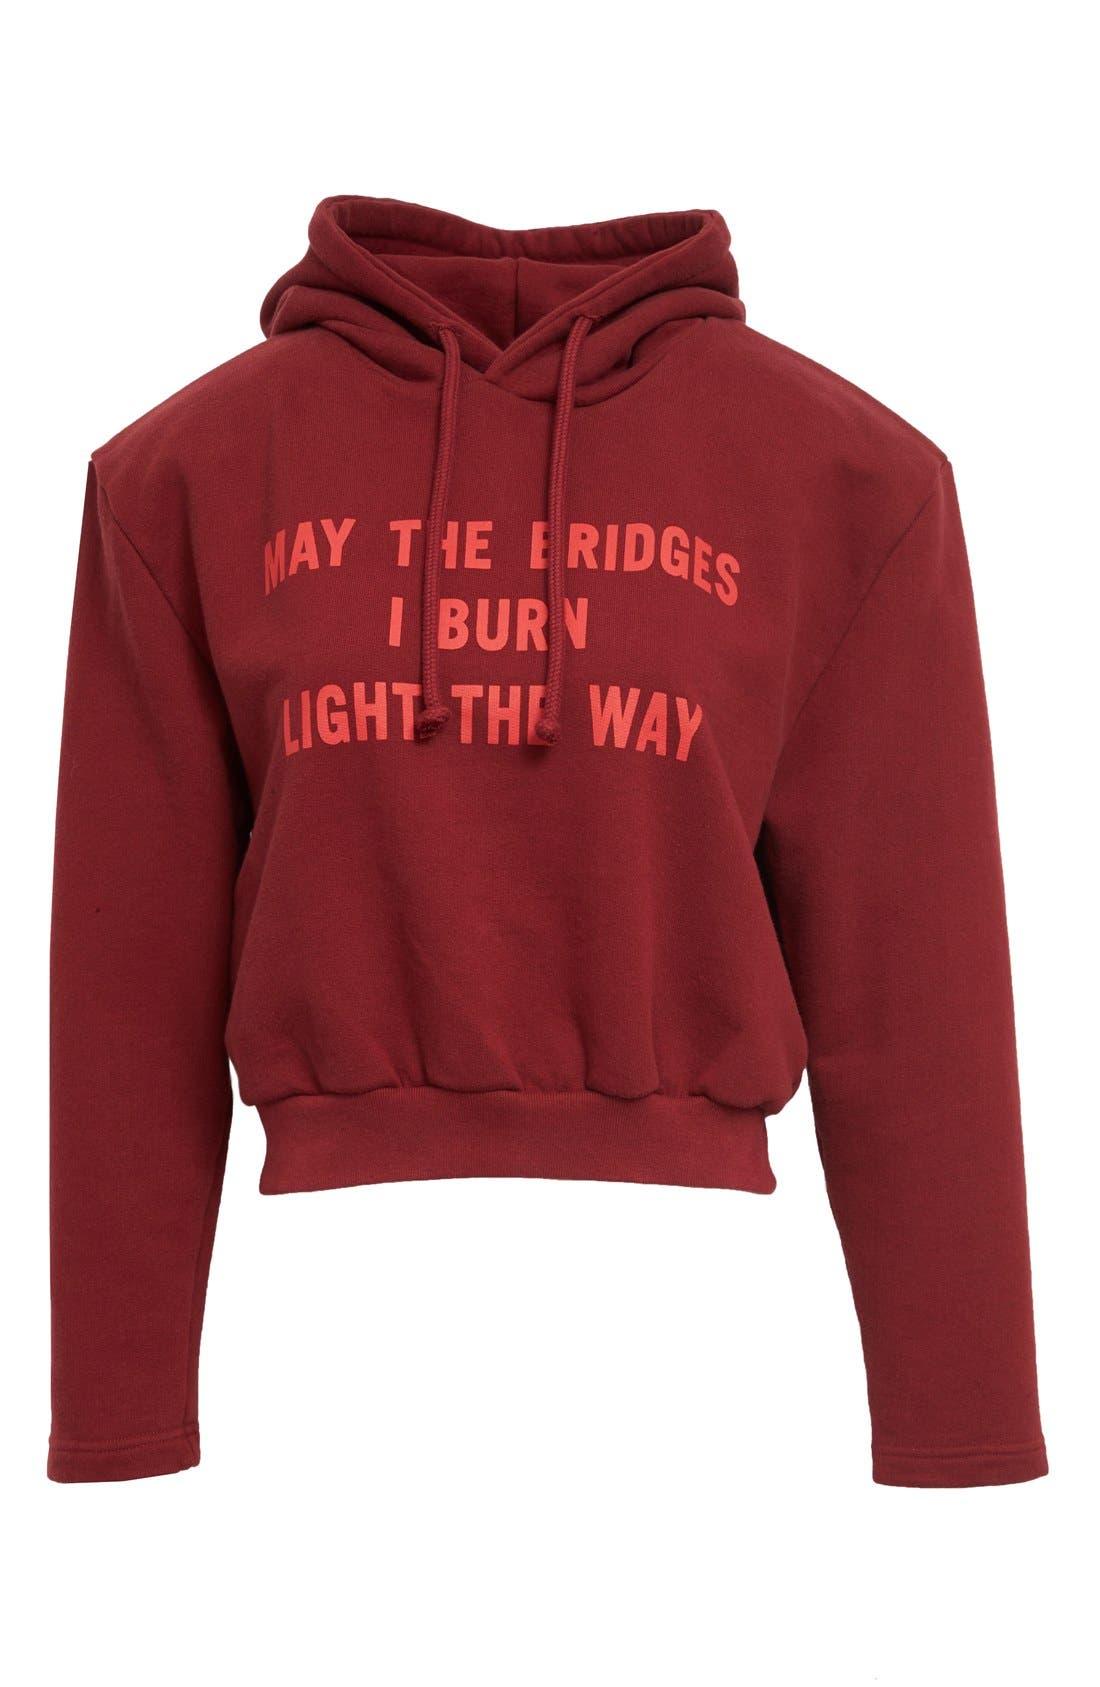 VETEMENTS,                             May the Bridges I Burn Light the Way Football Shoulder Hoodie,                             Alternate thumbnail 7, color,                             930